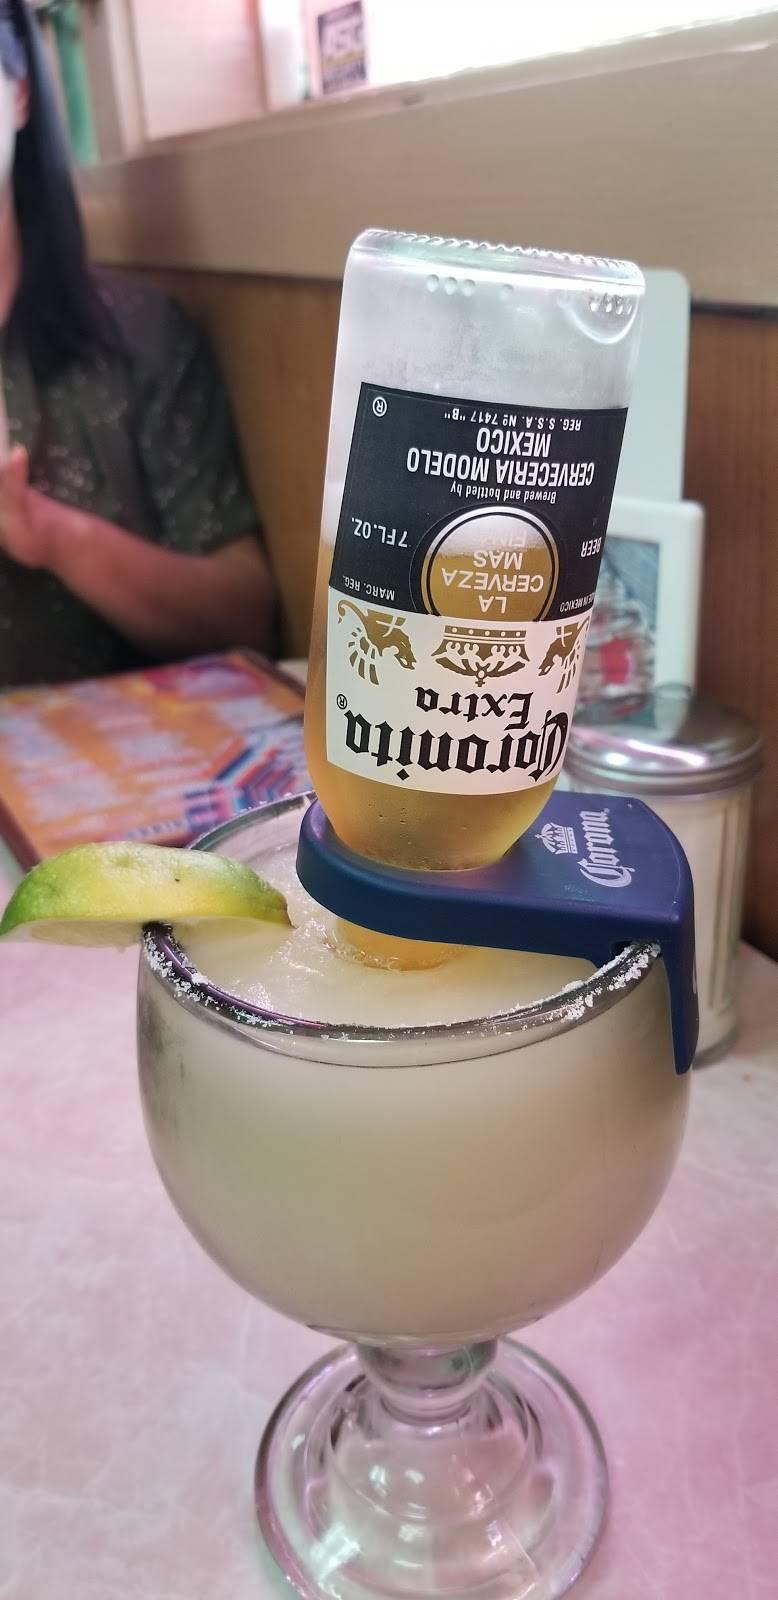 Fajitas Jalisco Restaurant | restaurant | 13030 Woodforest Blvd P, Houston, TX 77015, USA | 7133308005 OR +1 713-330-8005